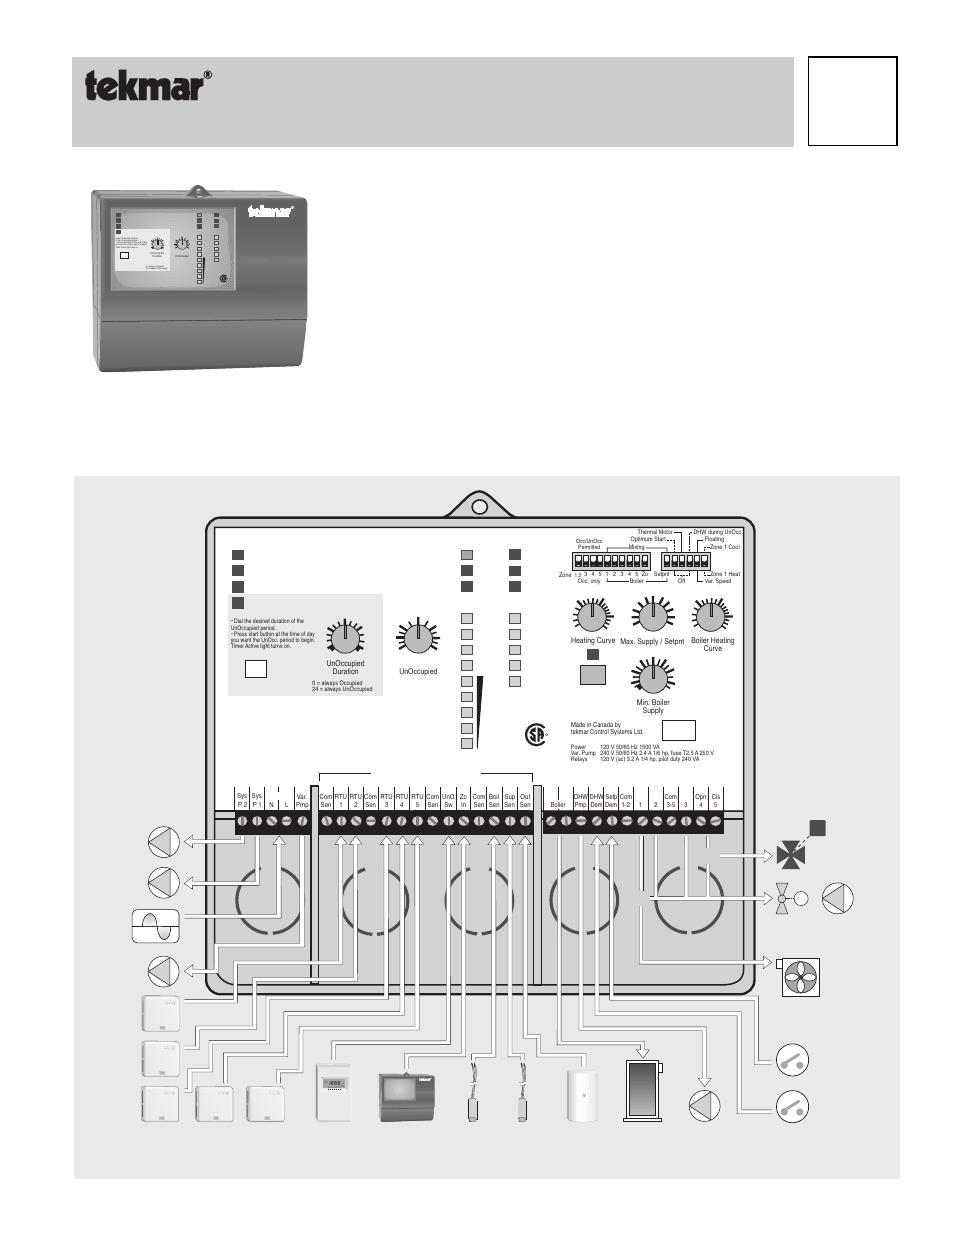 Mc5 Installation Diagrams Download To Print Installation Diagram